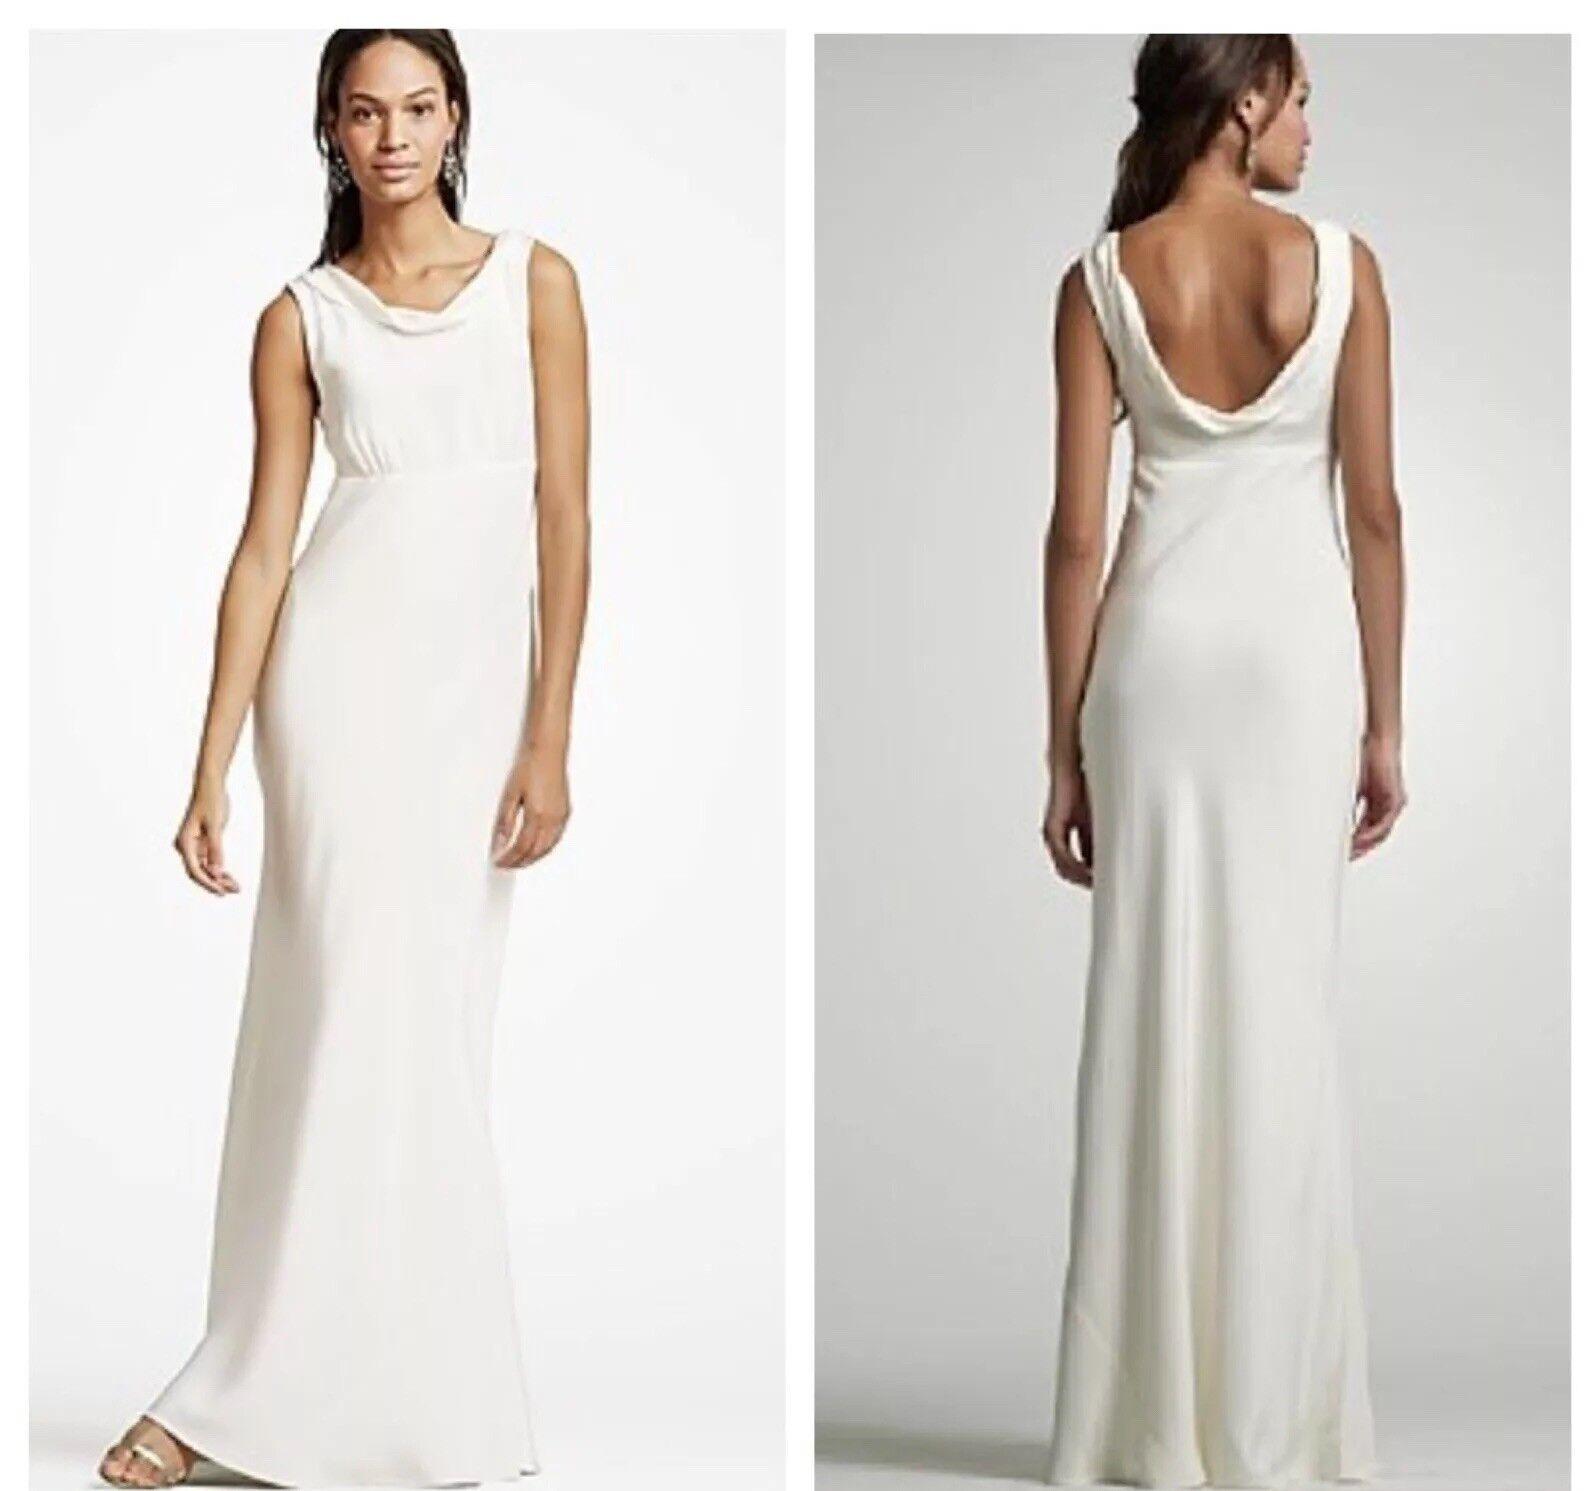 new j.crew hope gown wedding dress sz 2 ivory sleeveless 100% silk elegant  19848